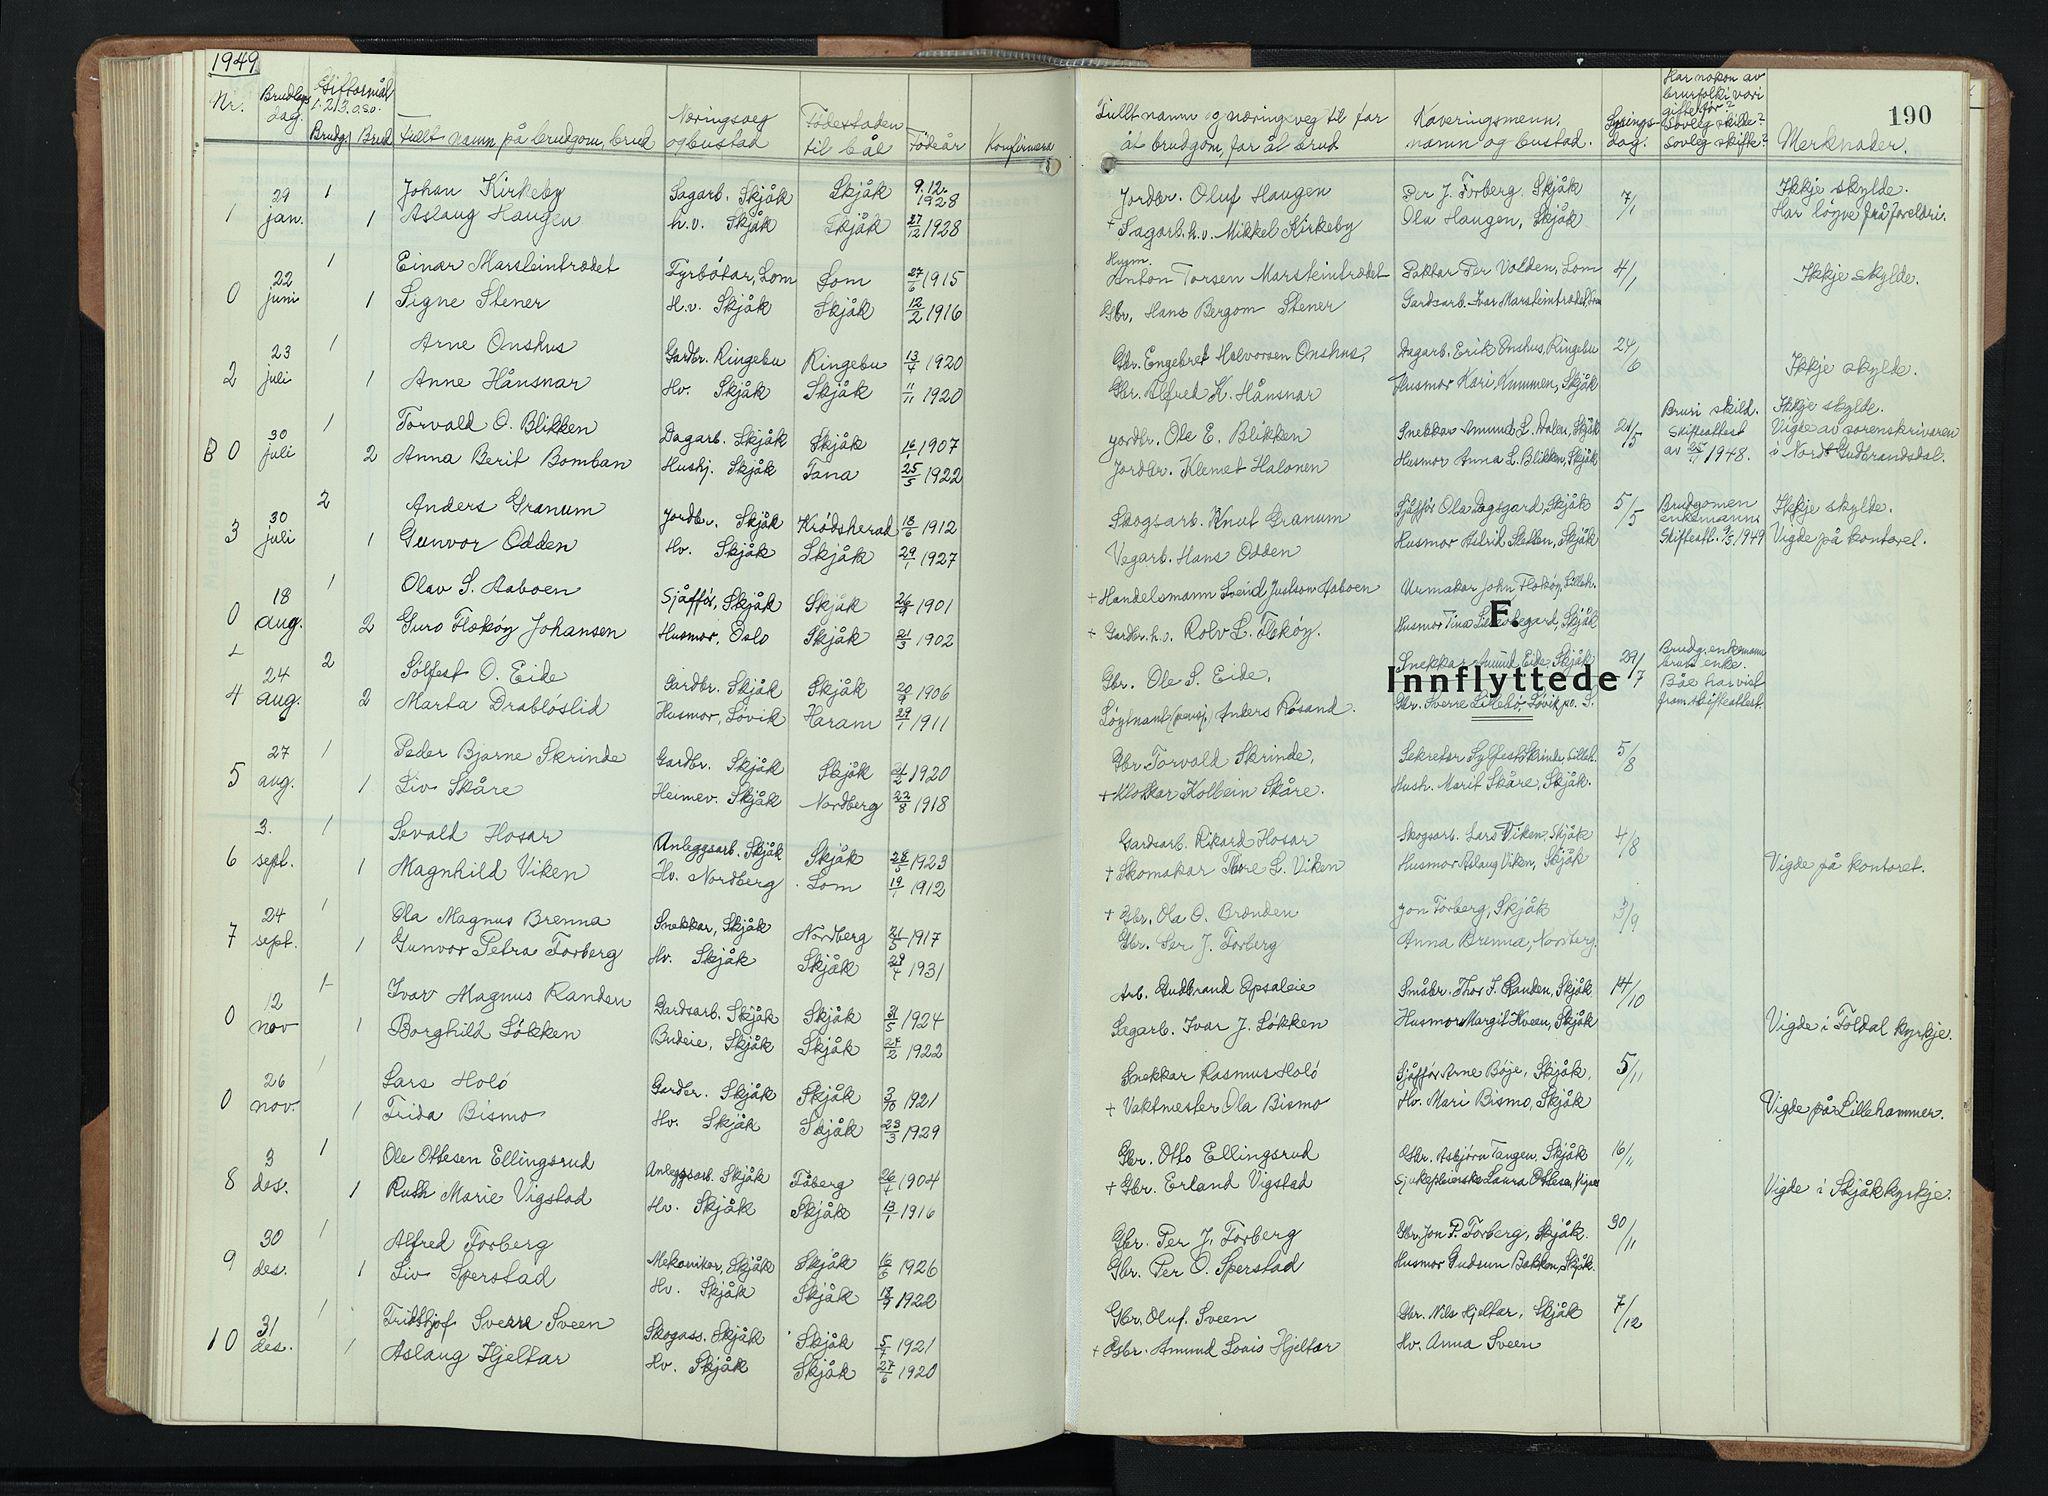 SAH, Skjåk prestekontor, Klokkerbok nr. 6, 1933-1954, s. 190